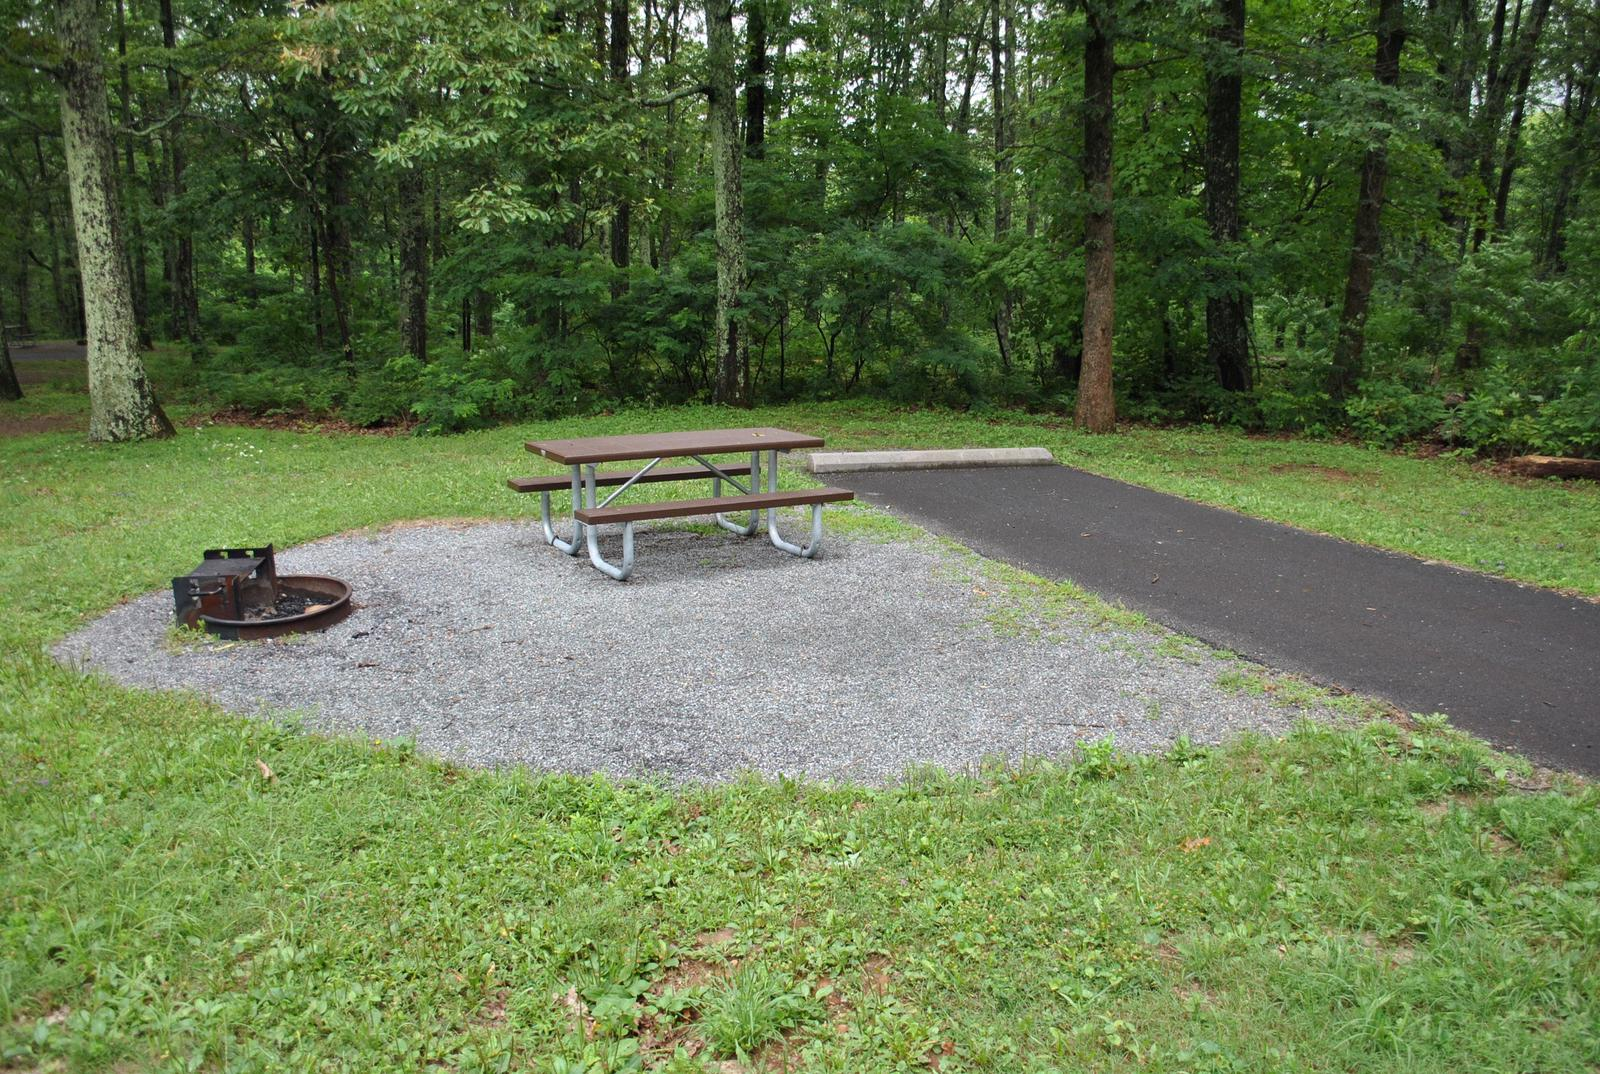 Mathews Arm Campground – Site A032